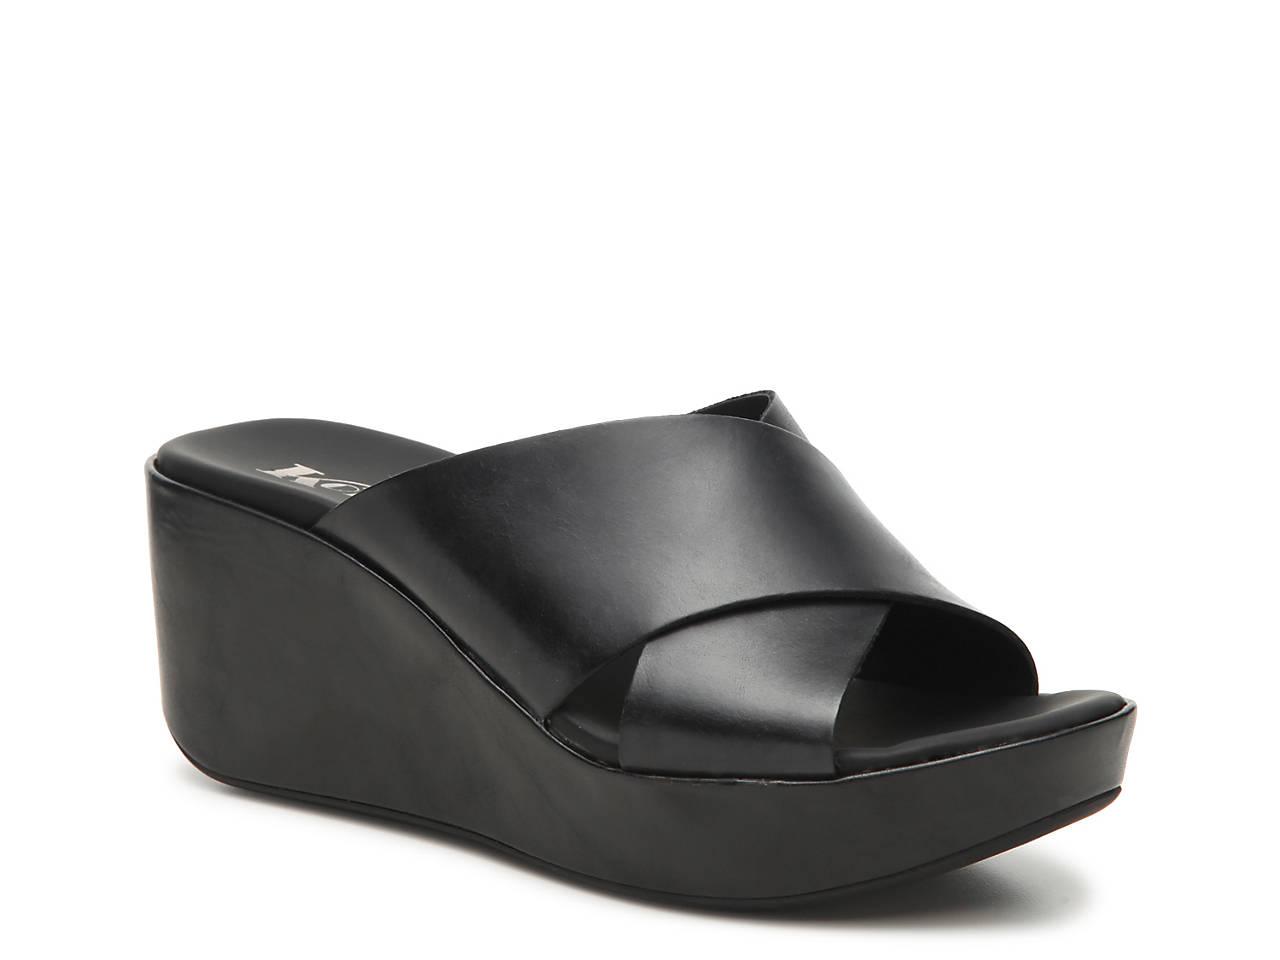 KORKS Madera Wedge Platform Sandal UoS7uAlu